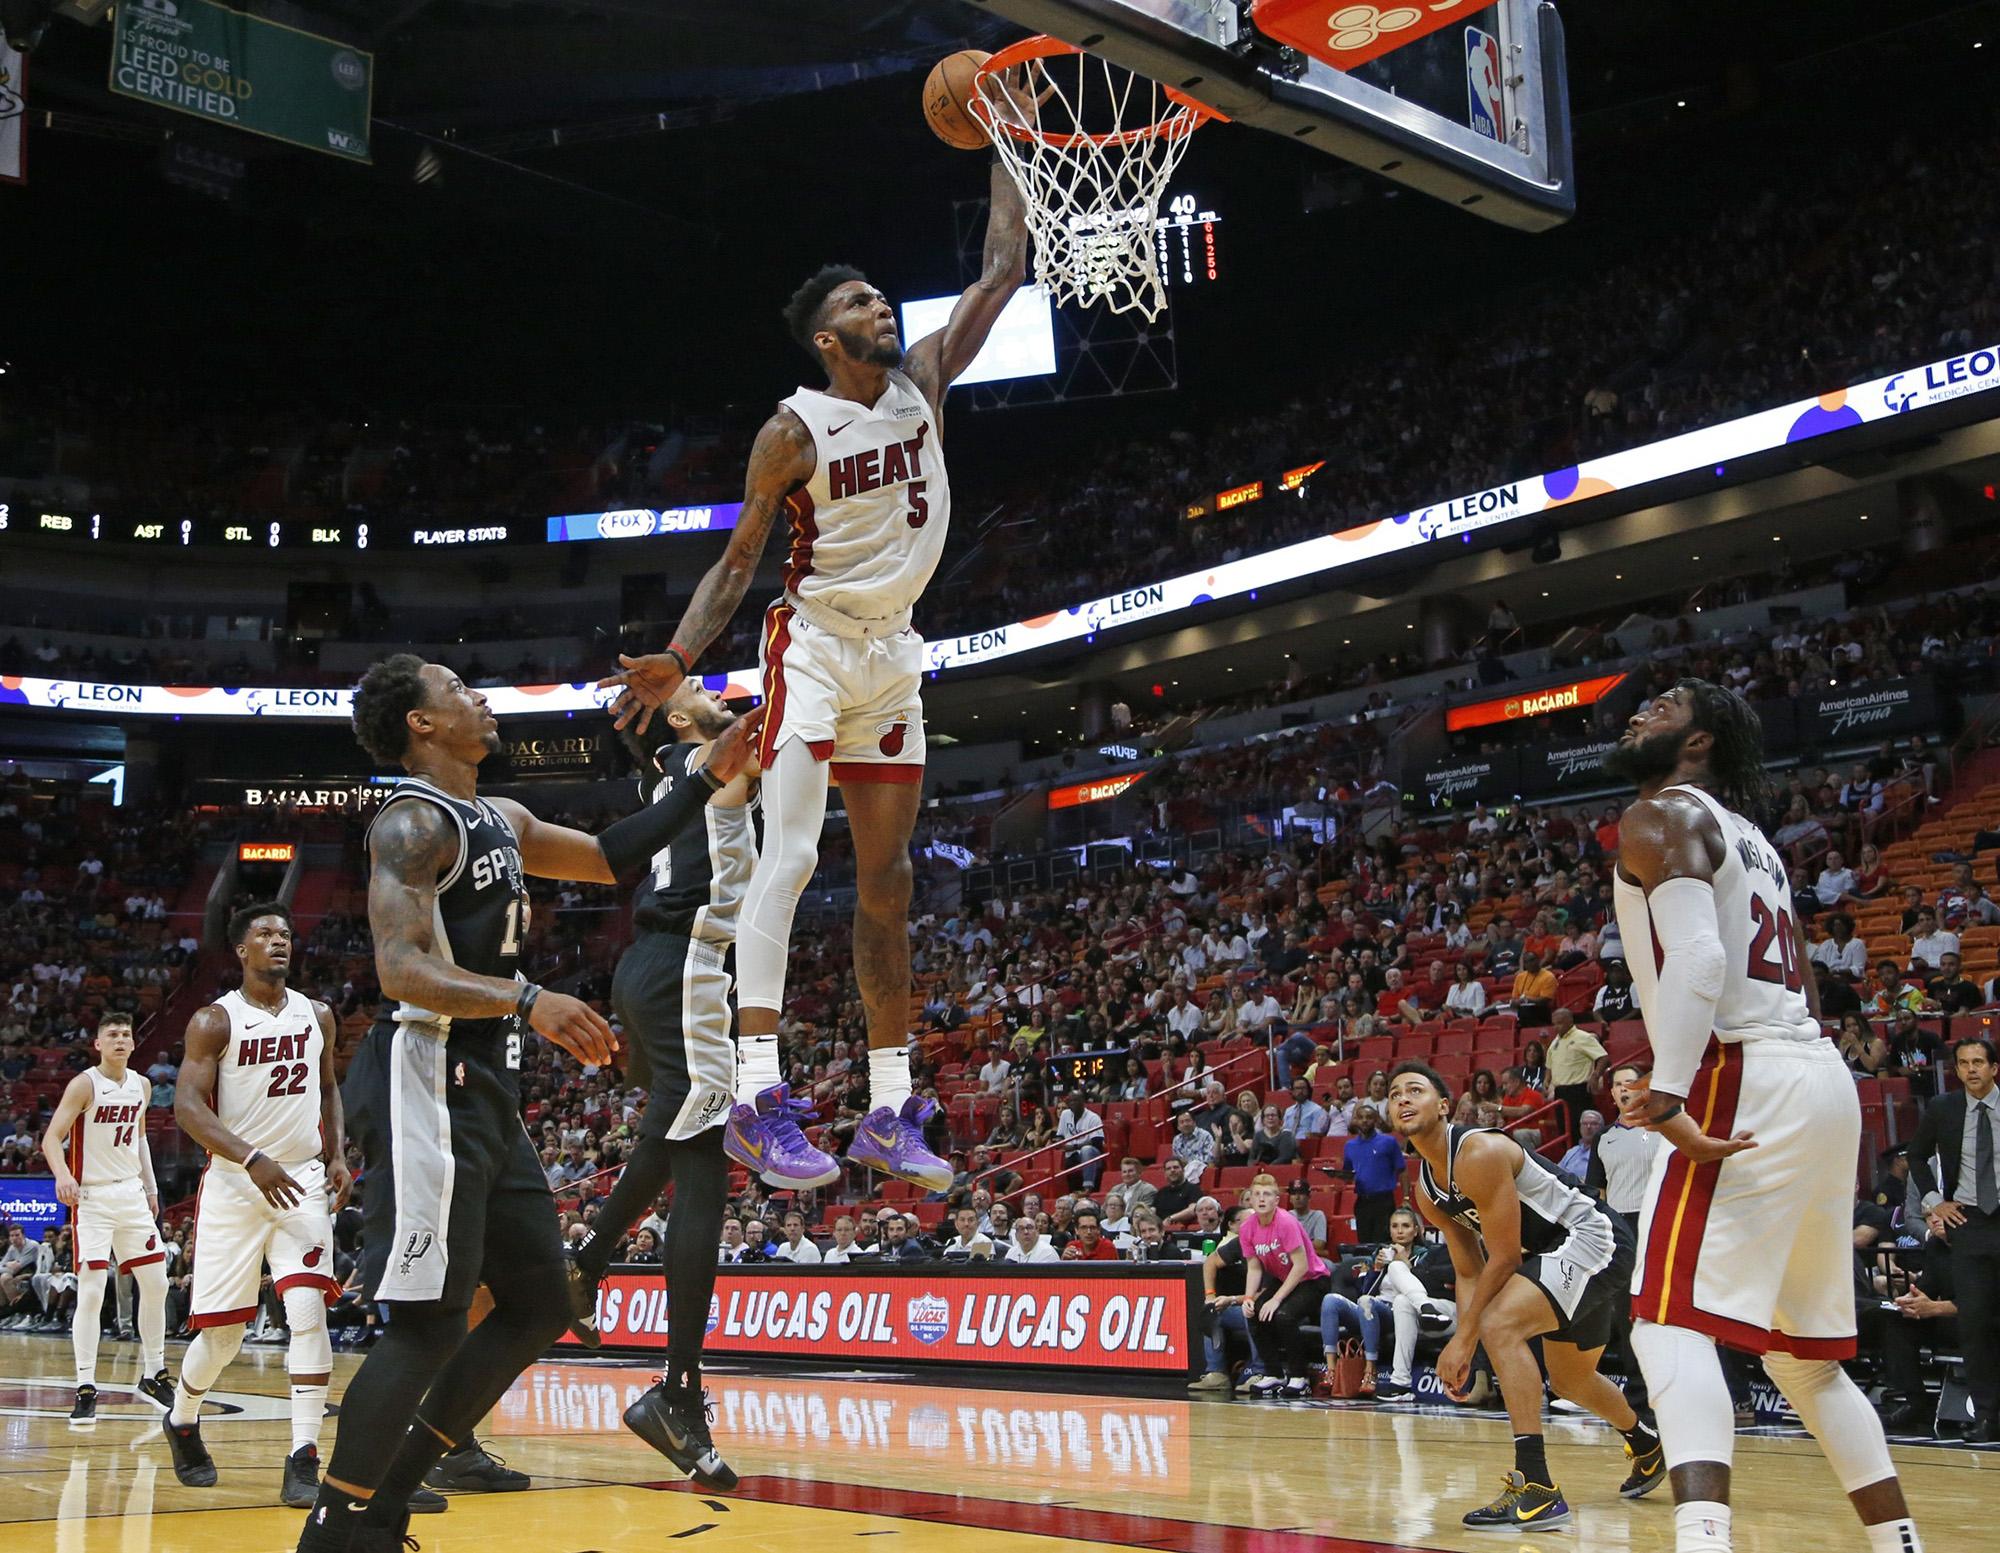 Heat's Derrick Jones Jr. proving to be lightning with a throttle